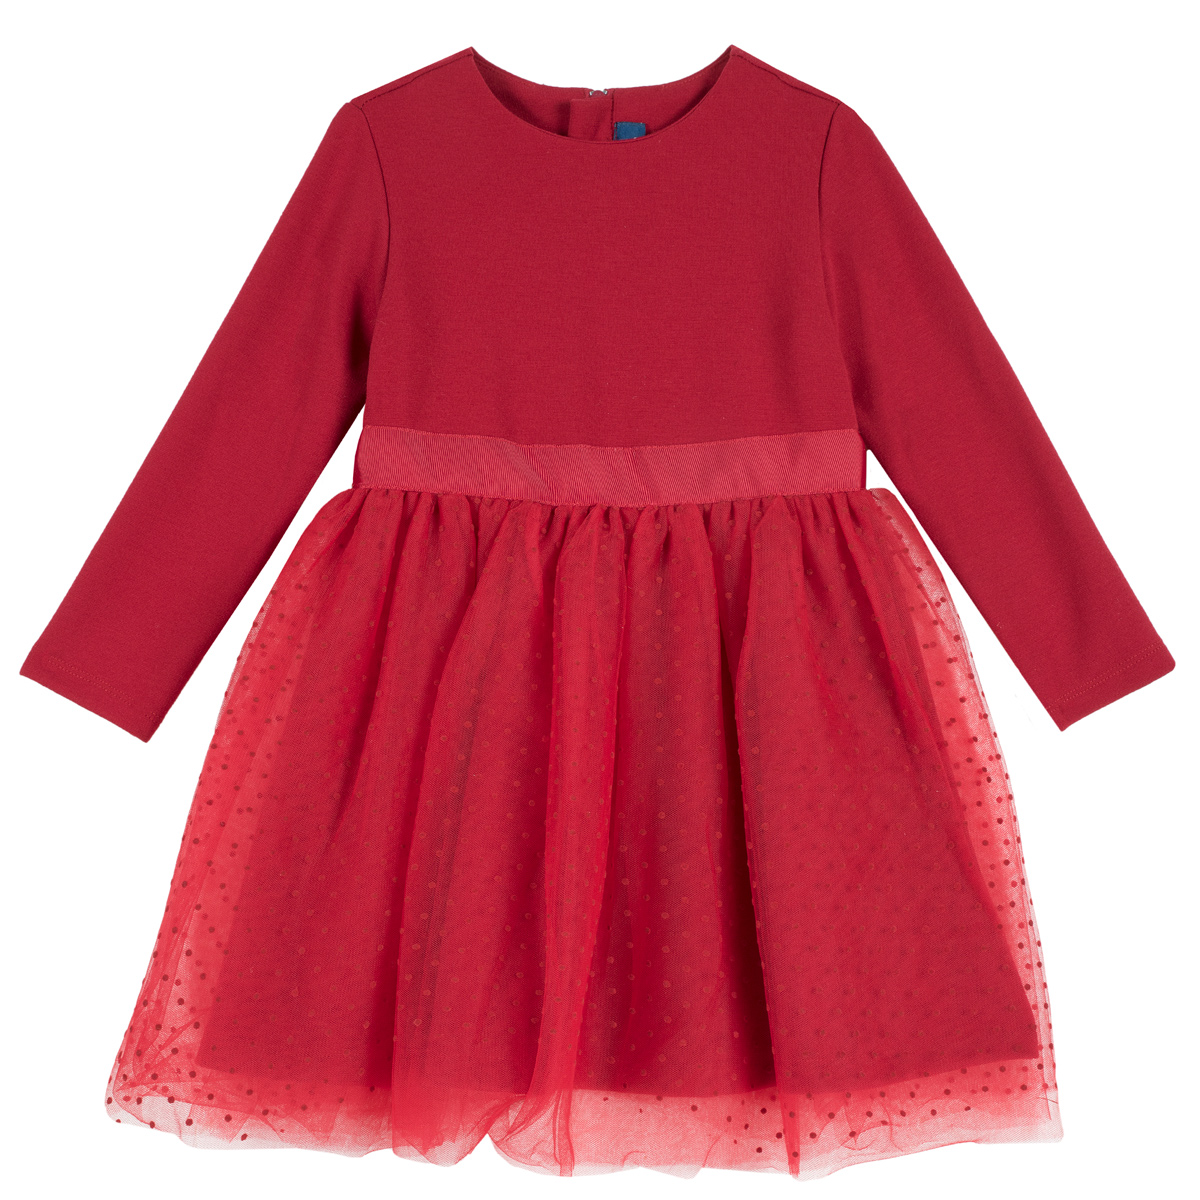 Rochie copii Chicco, volan din tulle, rosu, 03567